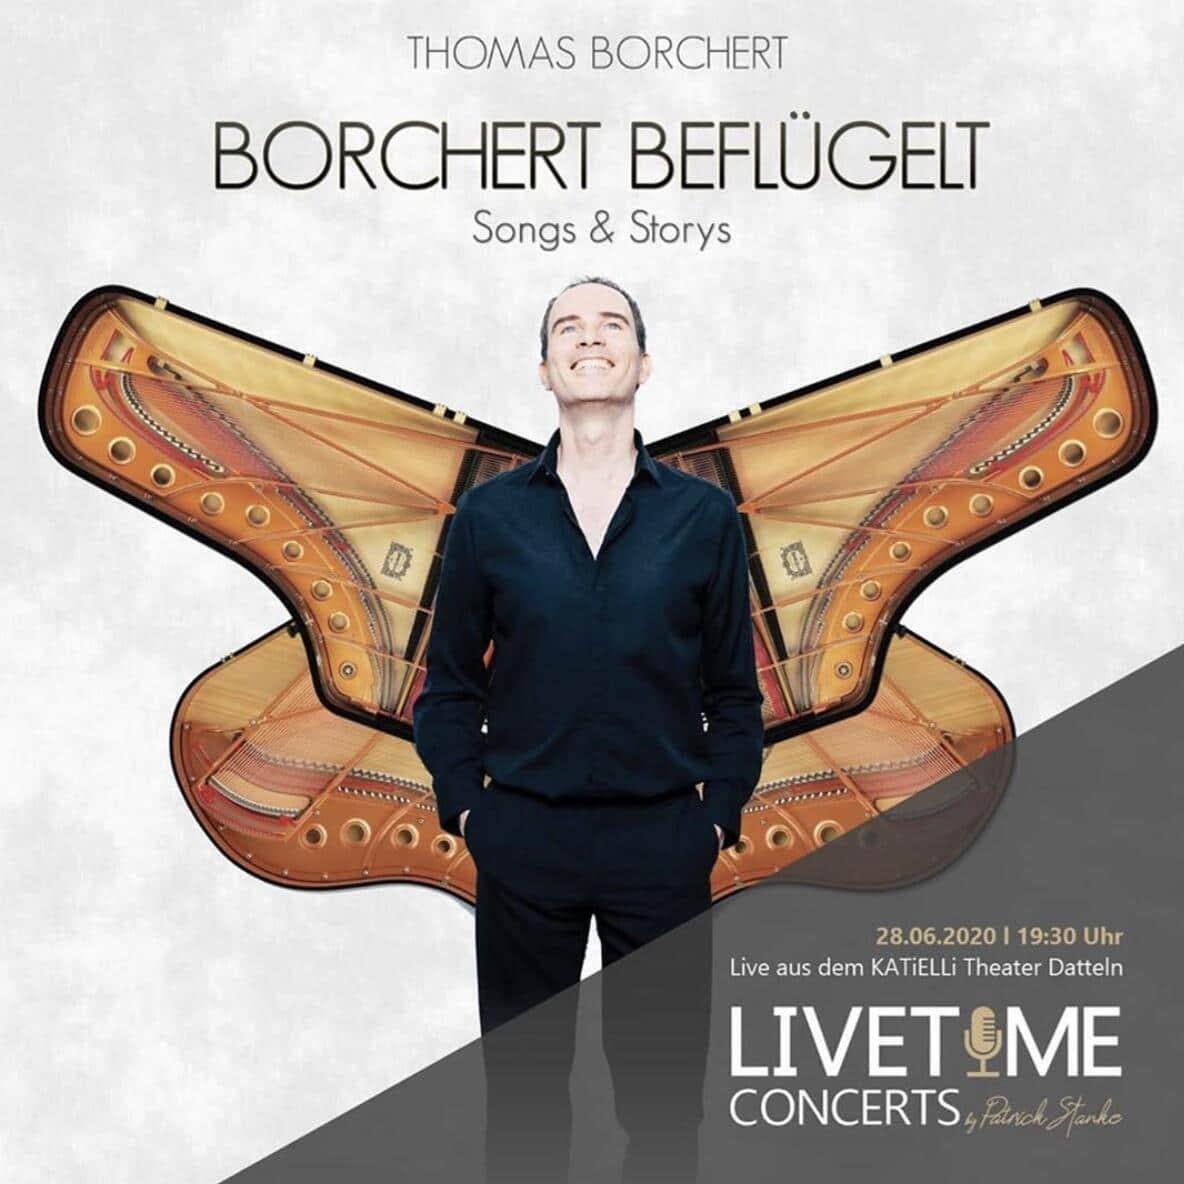 beflügelt-lifetime-concerts